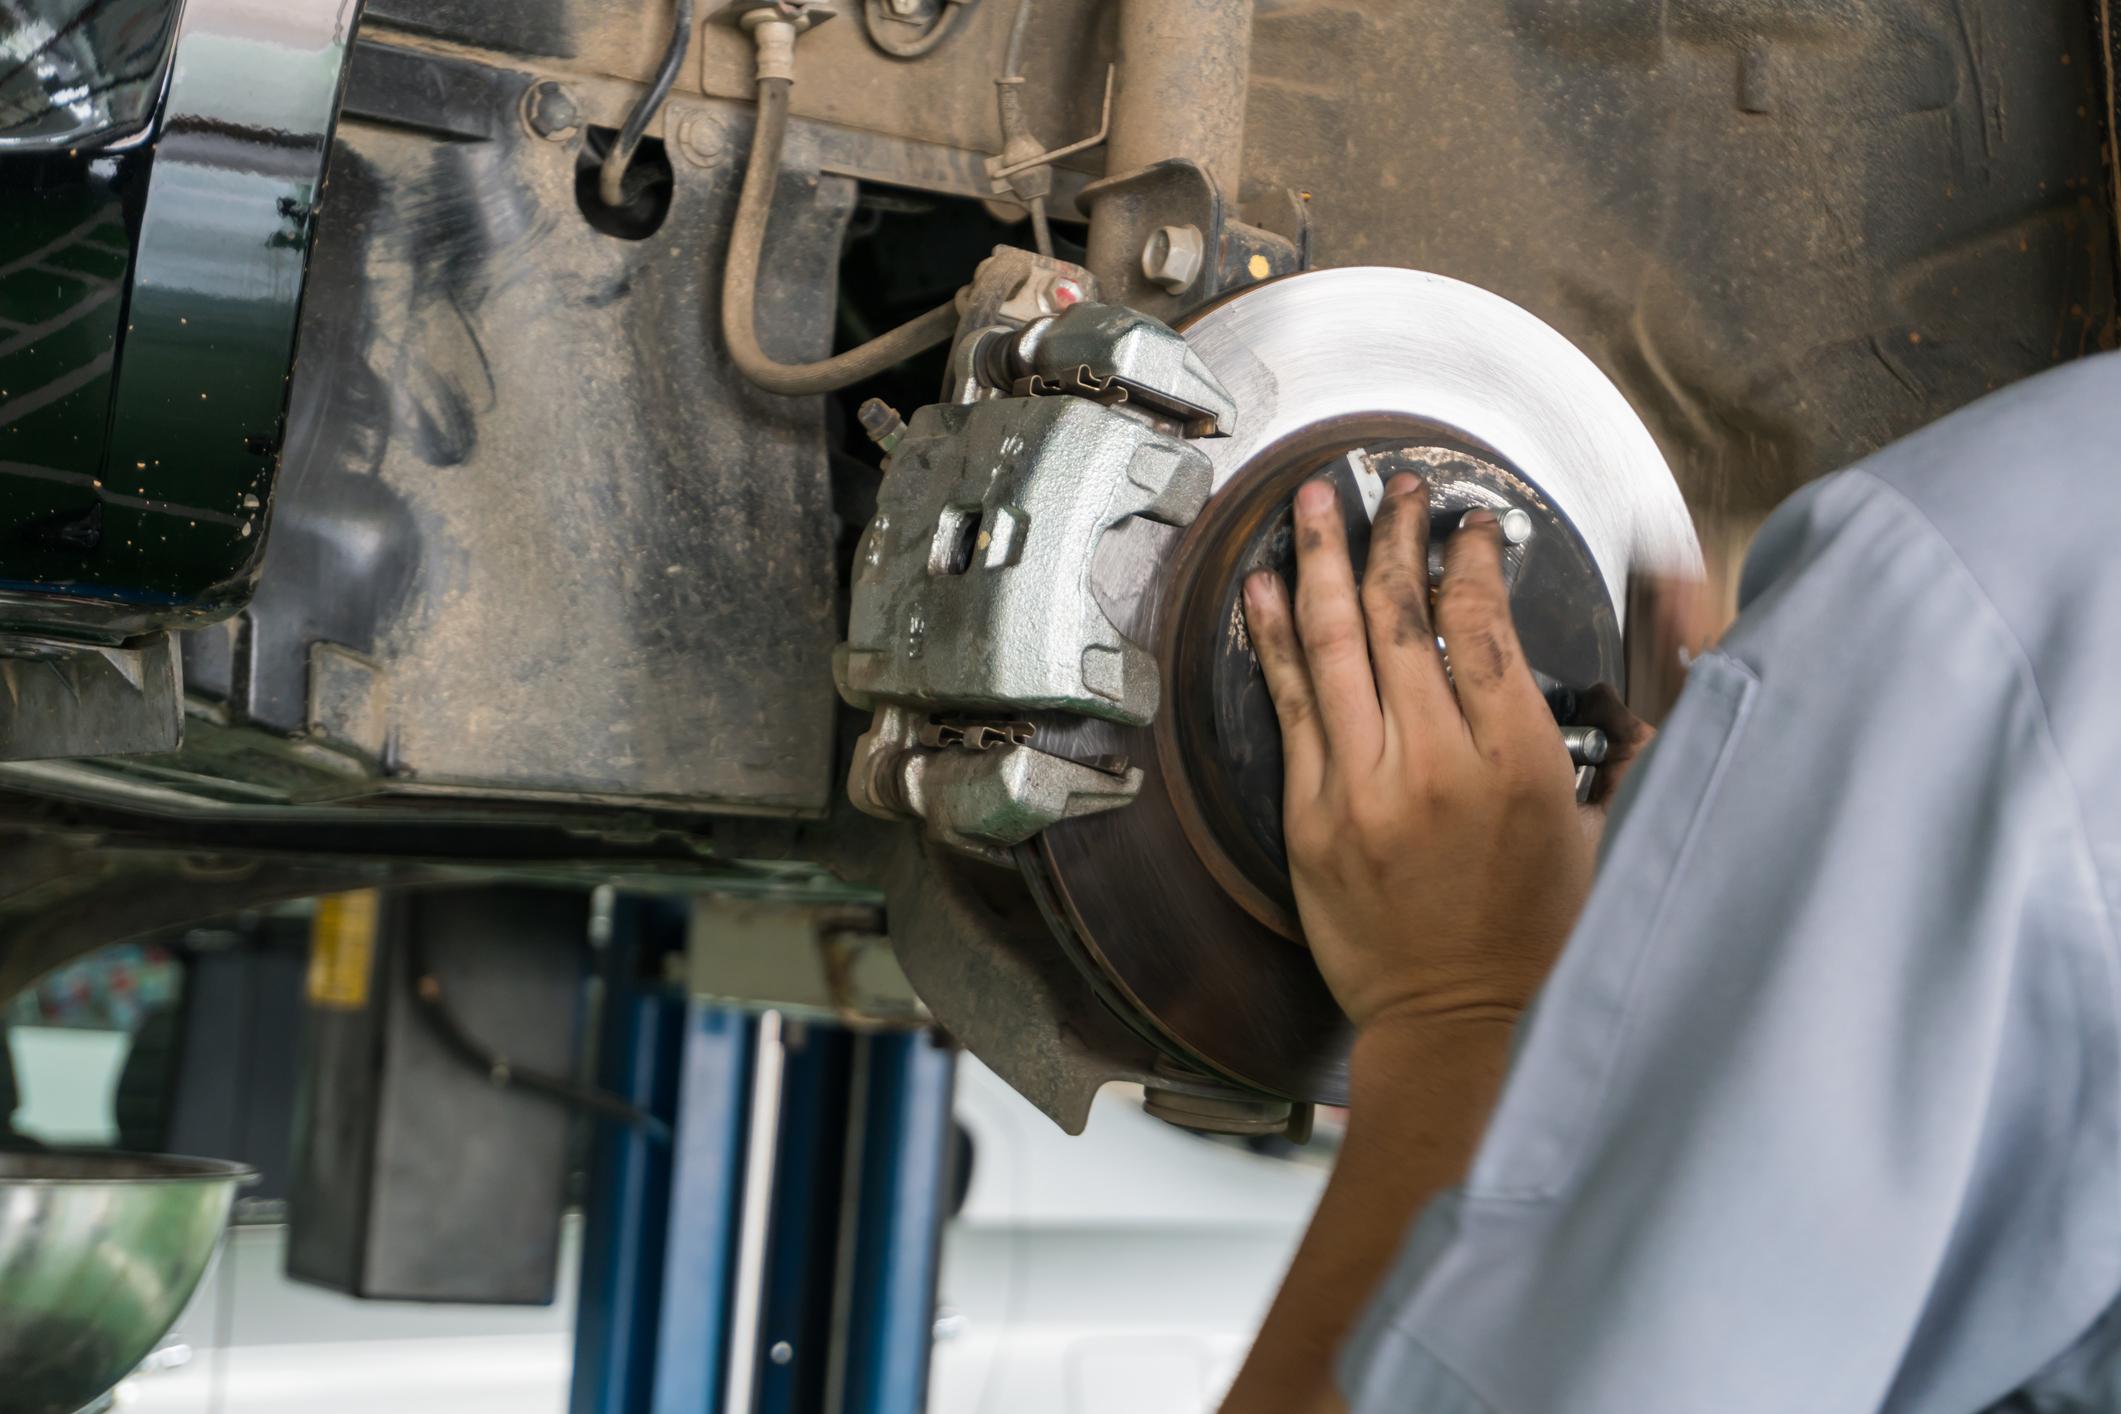 Optimizingheavy-duty brake lifespan